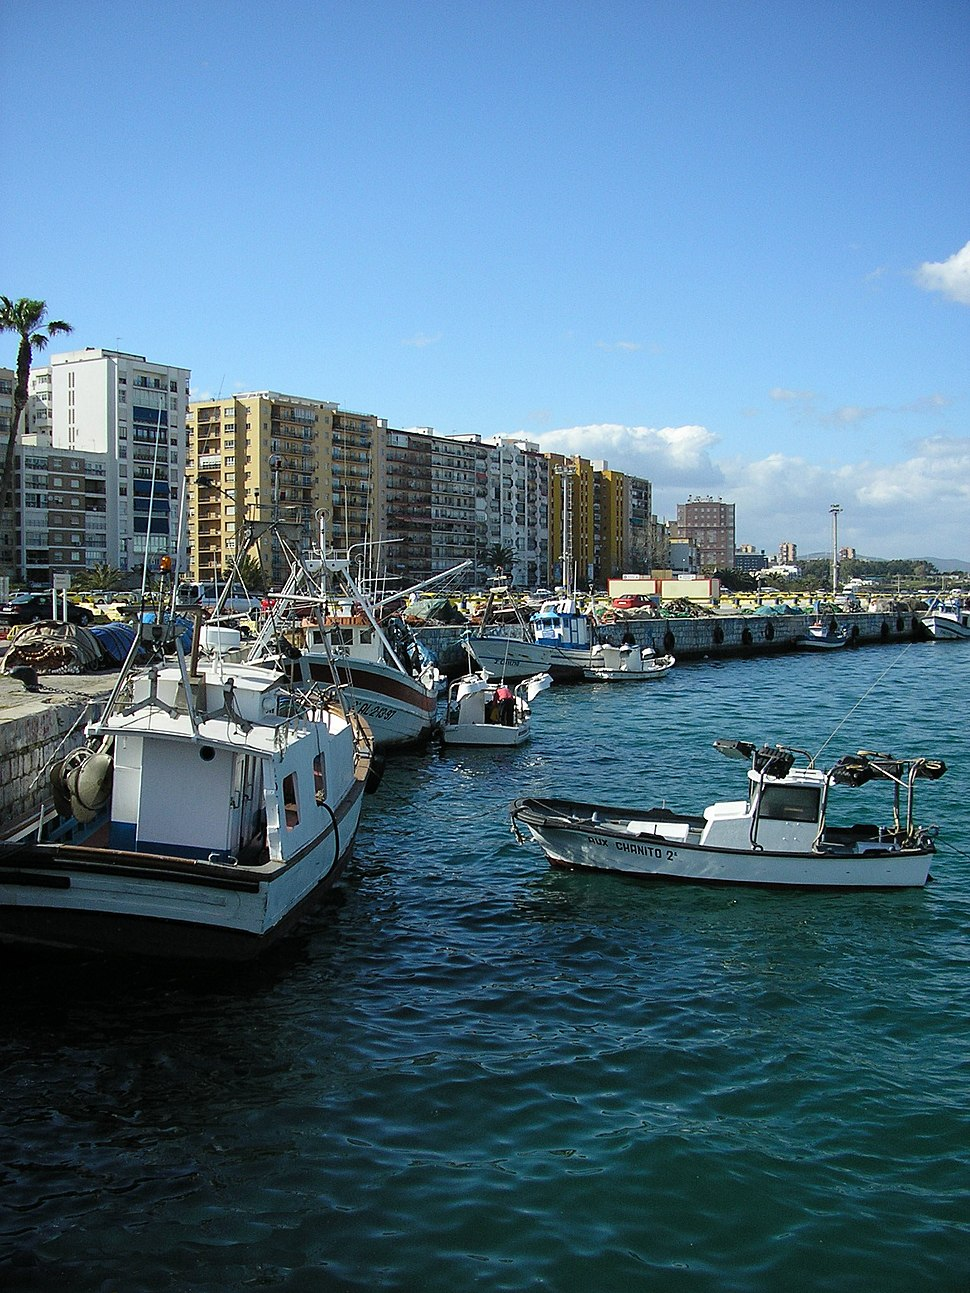 Algeciras Darsena